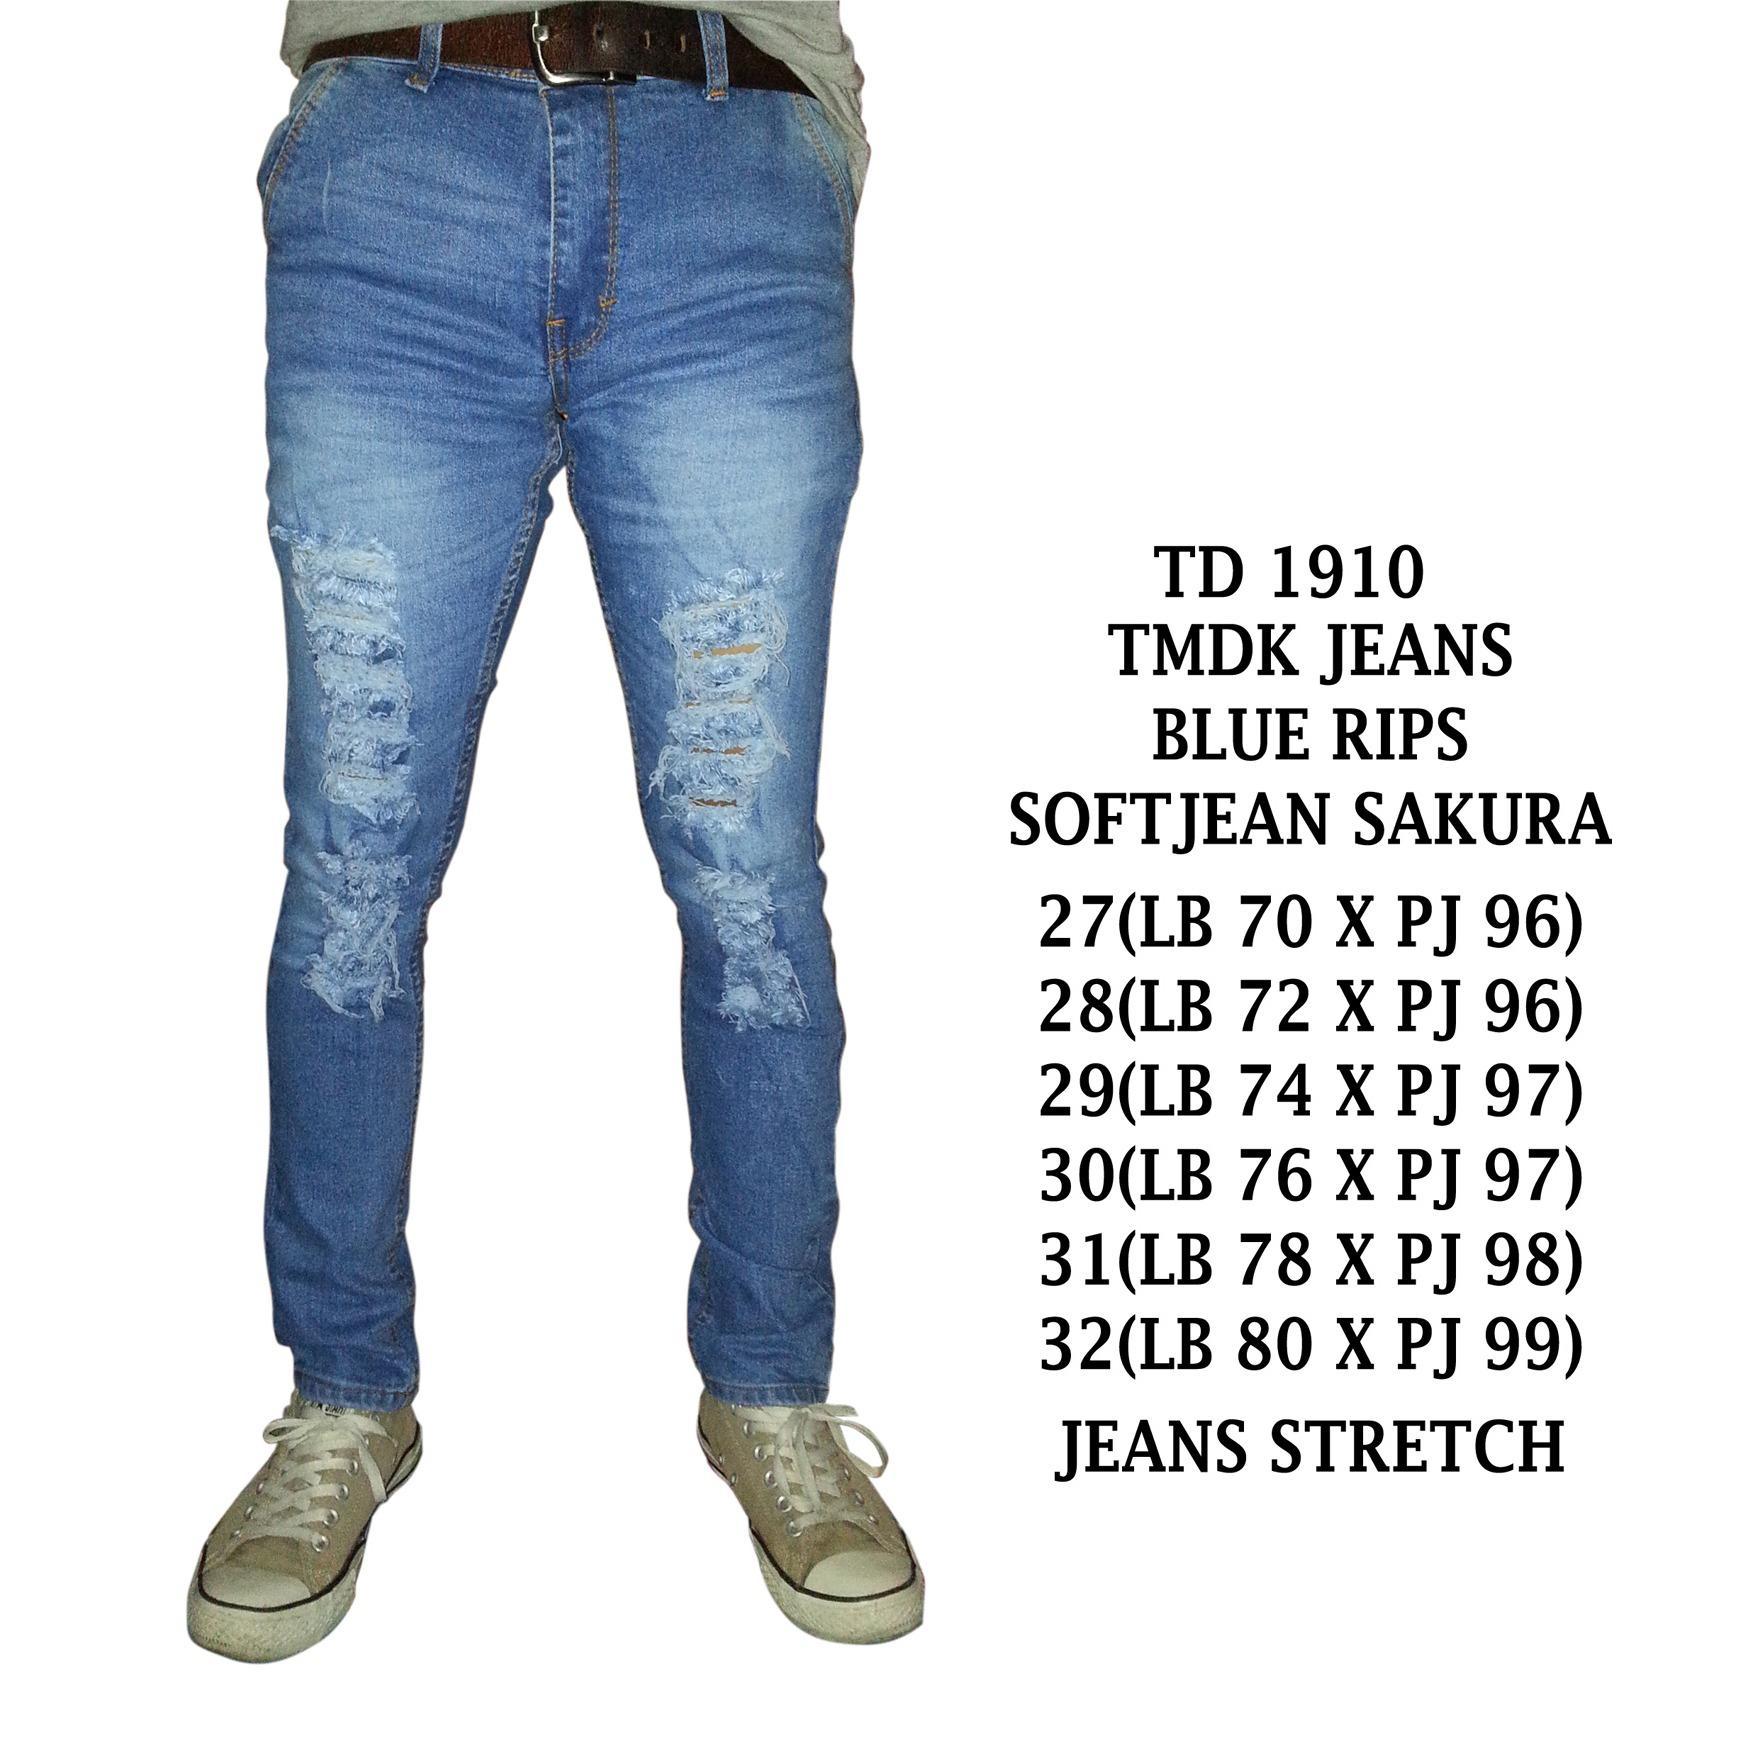 Harga Tmdk Fashion Celana Jeans Panjang Sobek Ripped Pria Murah Murah